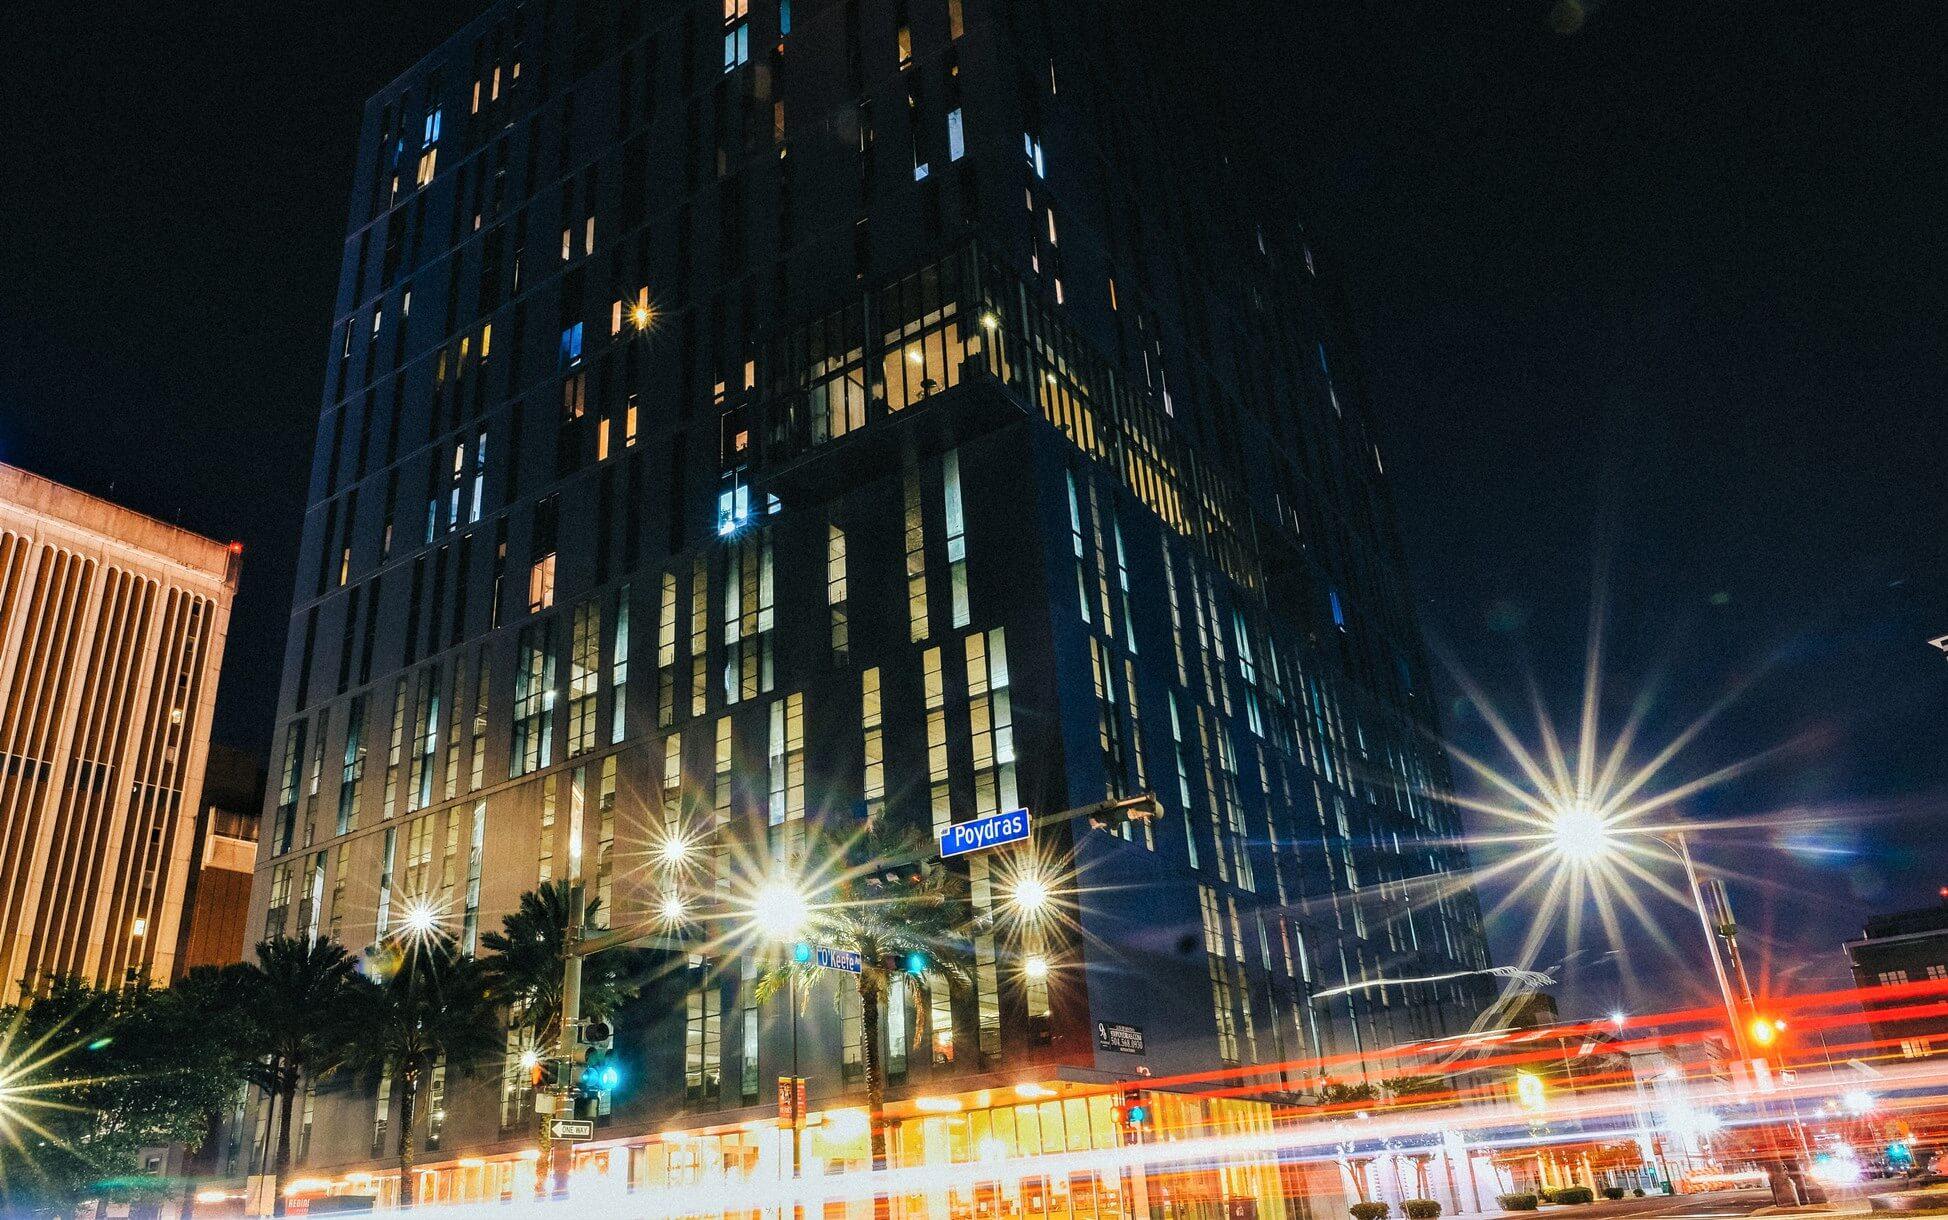 Street view pf 930 Poydras at night